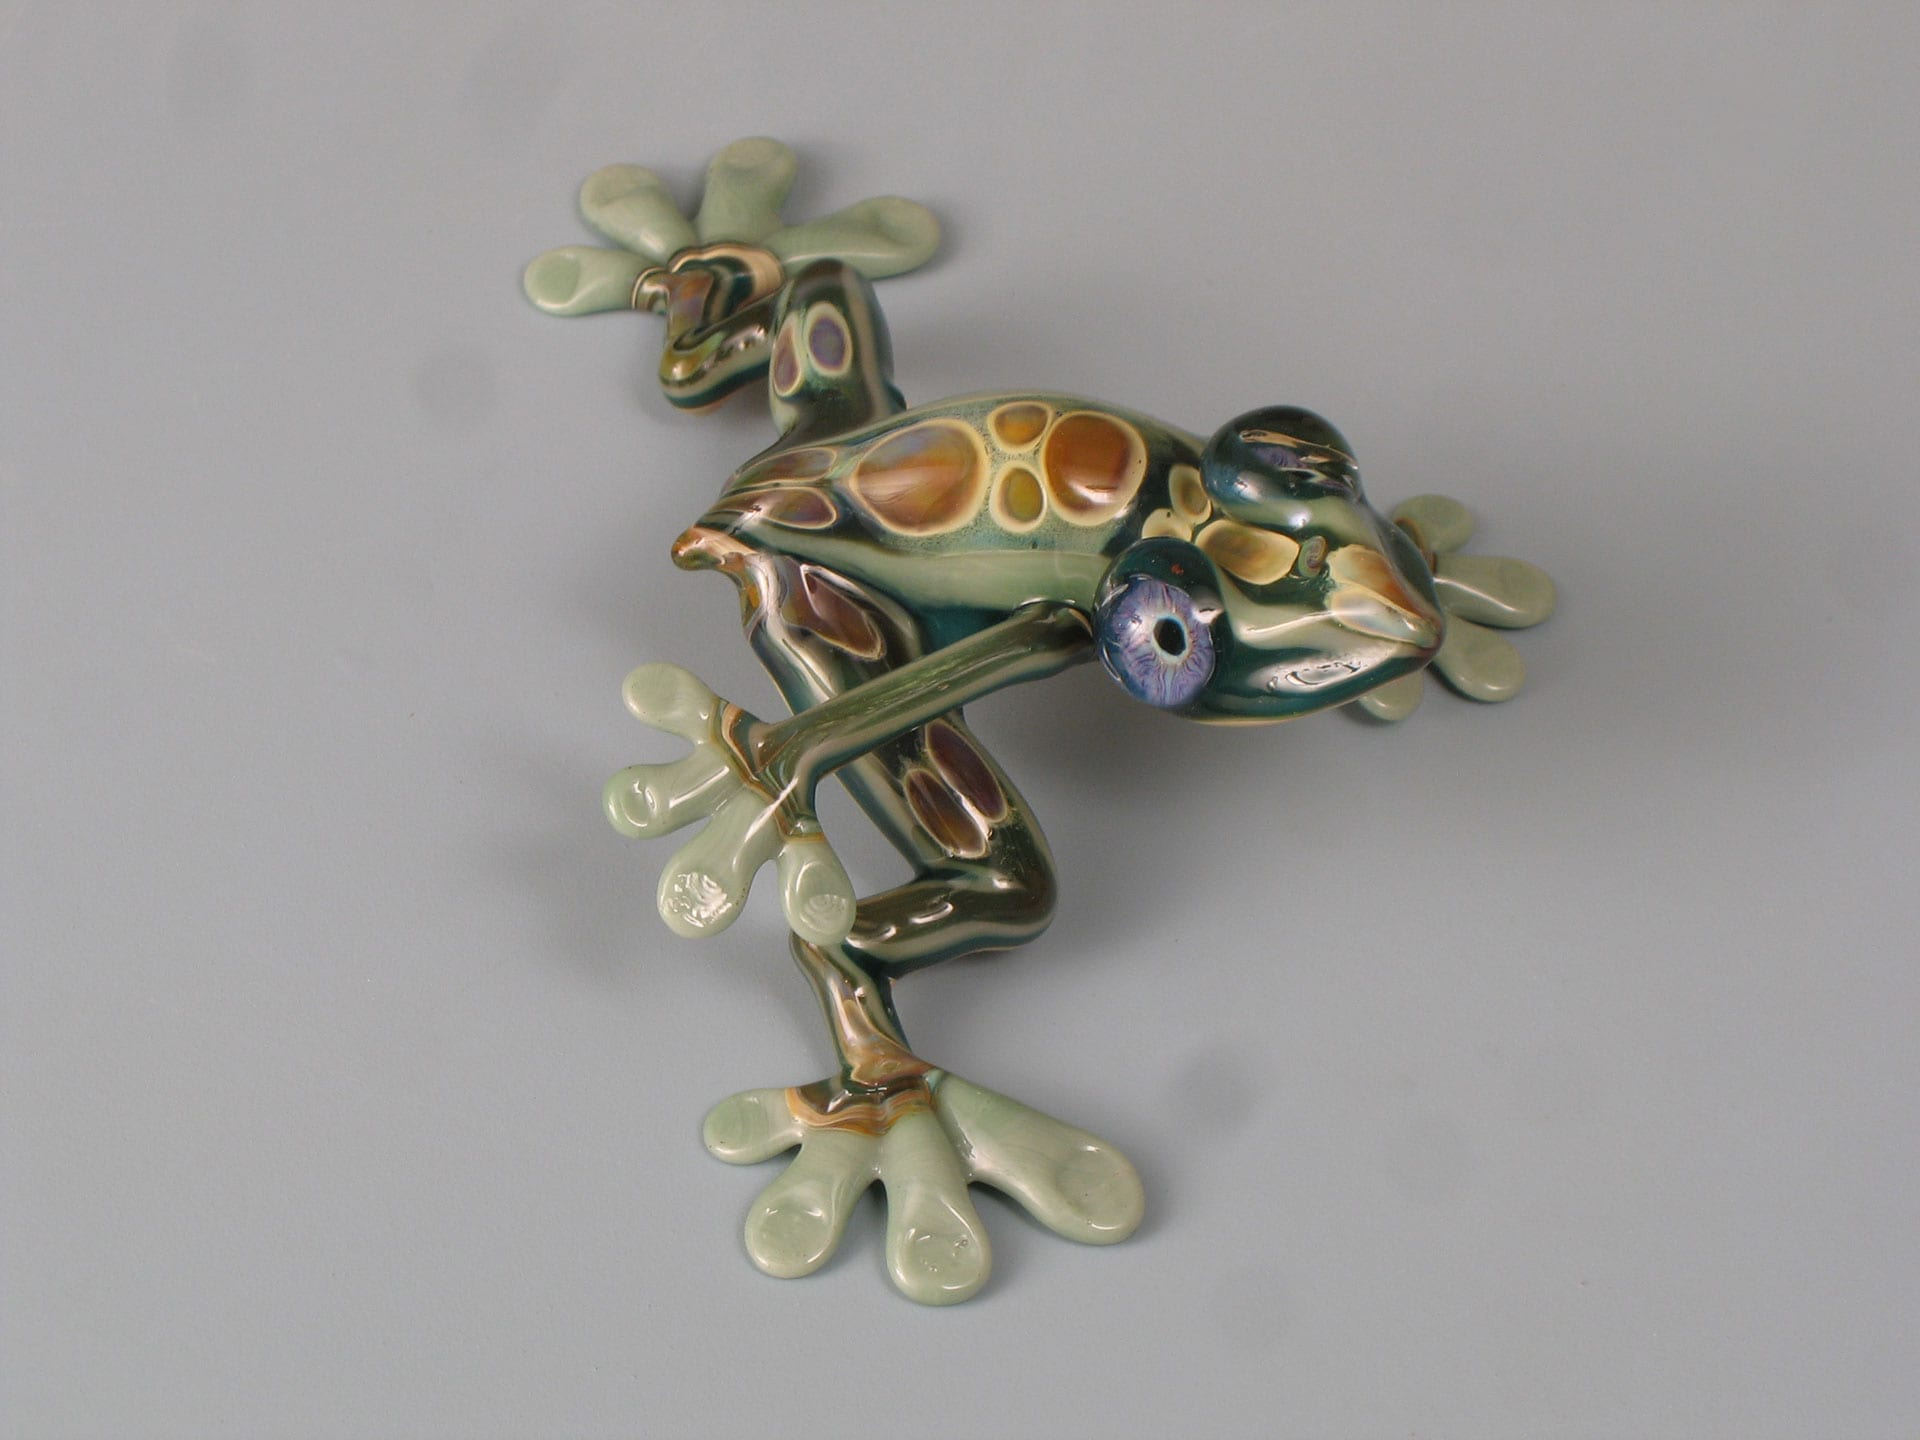 froggrn